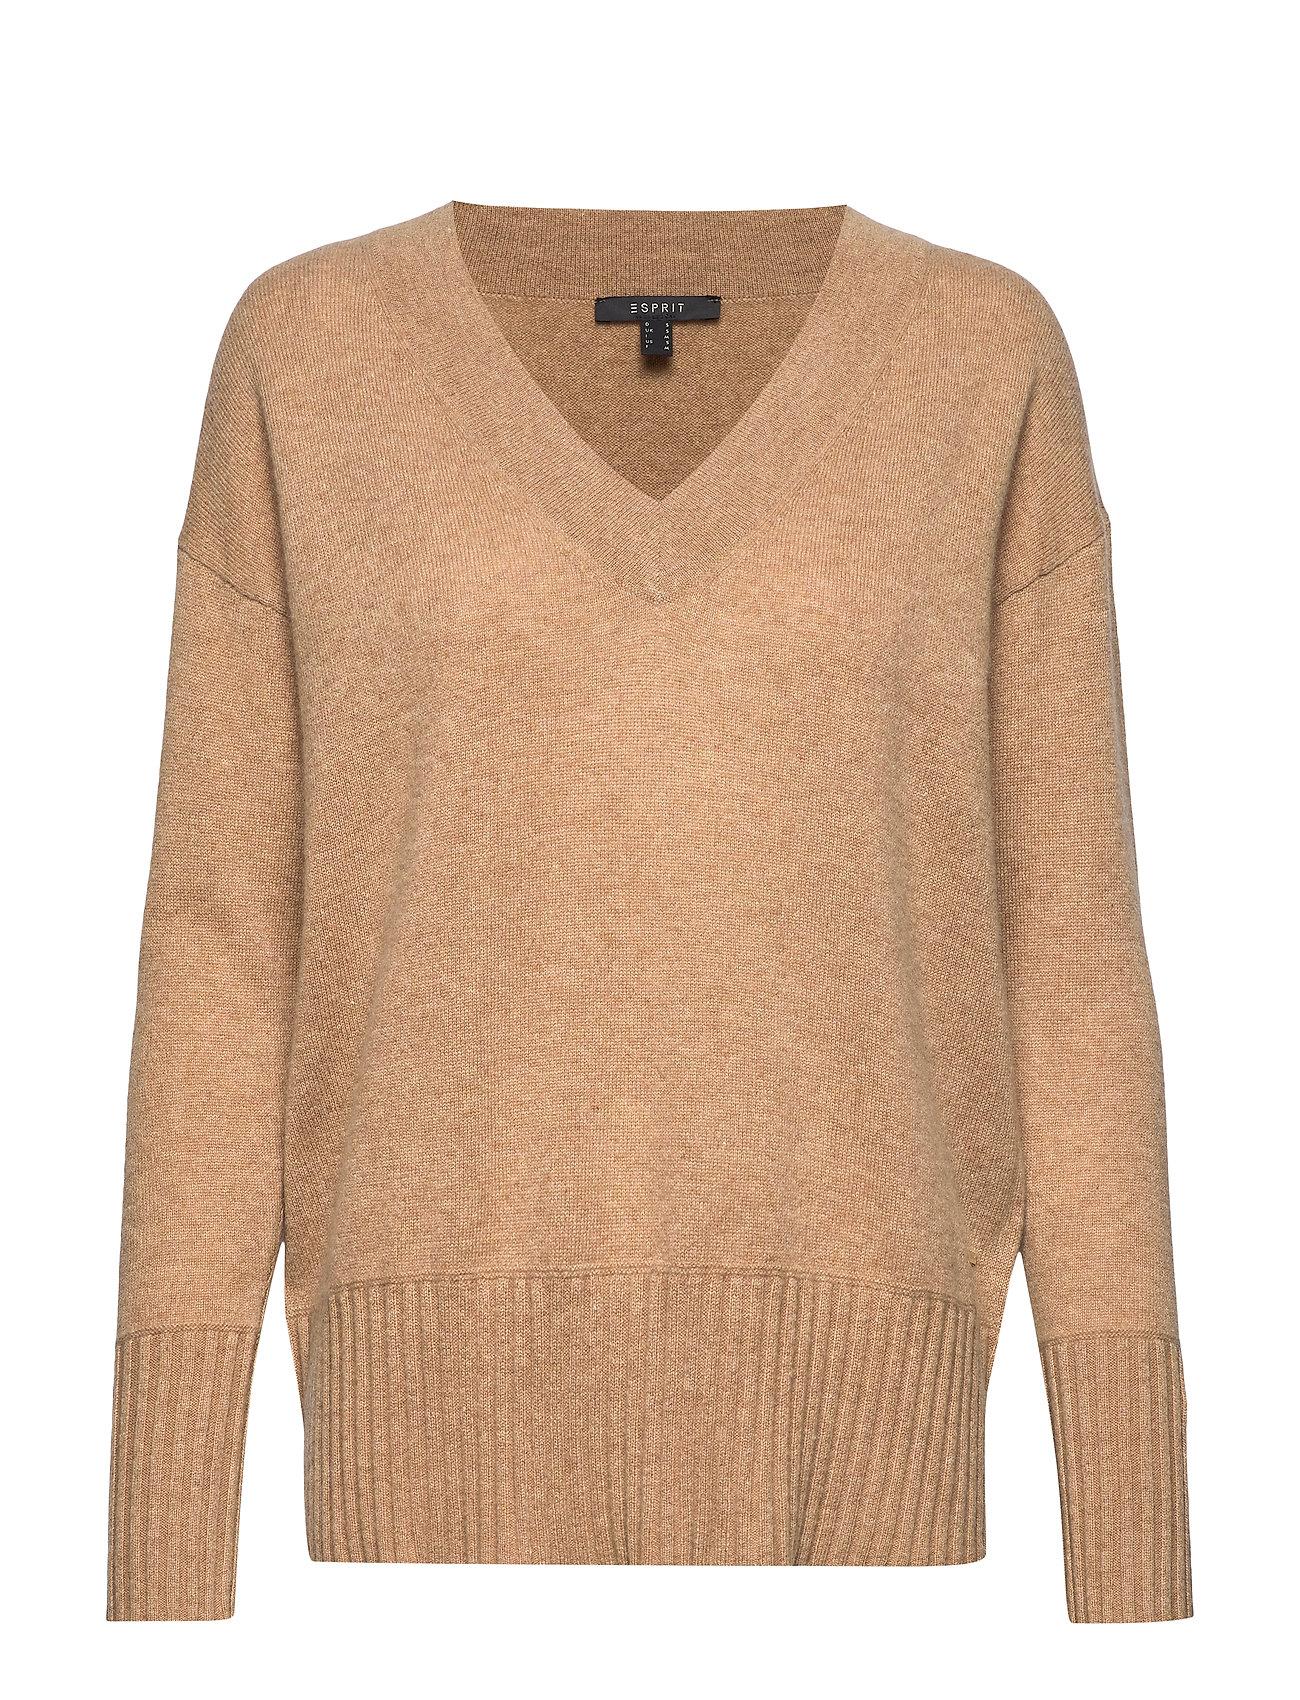 ESPRIT Sweaters Strickpullover Beige ESPRIT COLLECTION